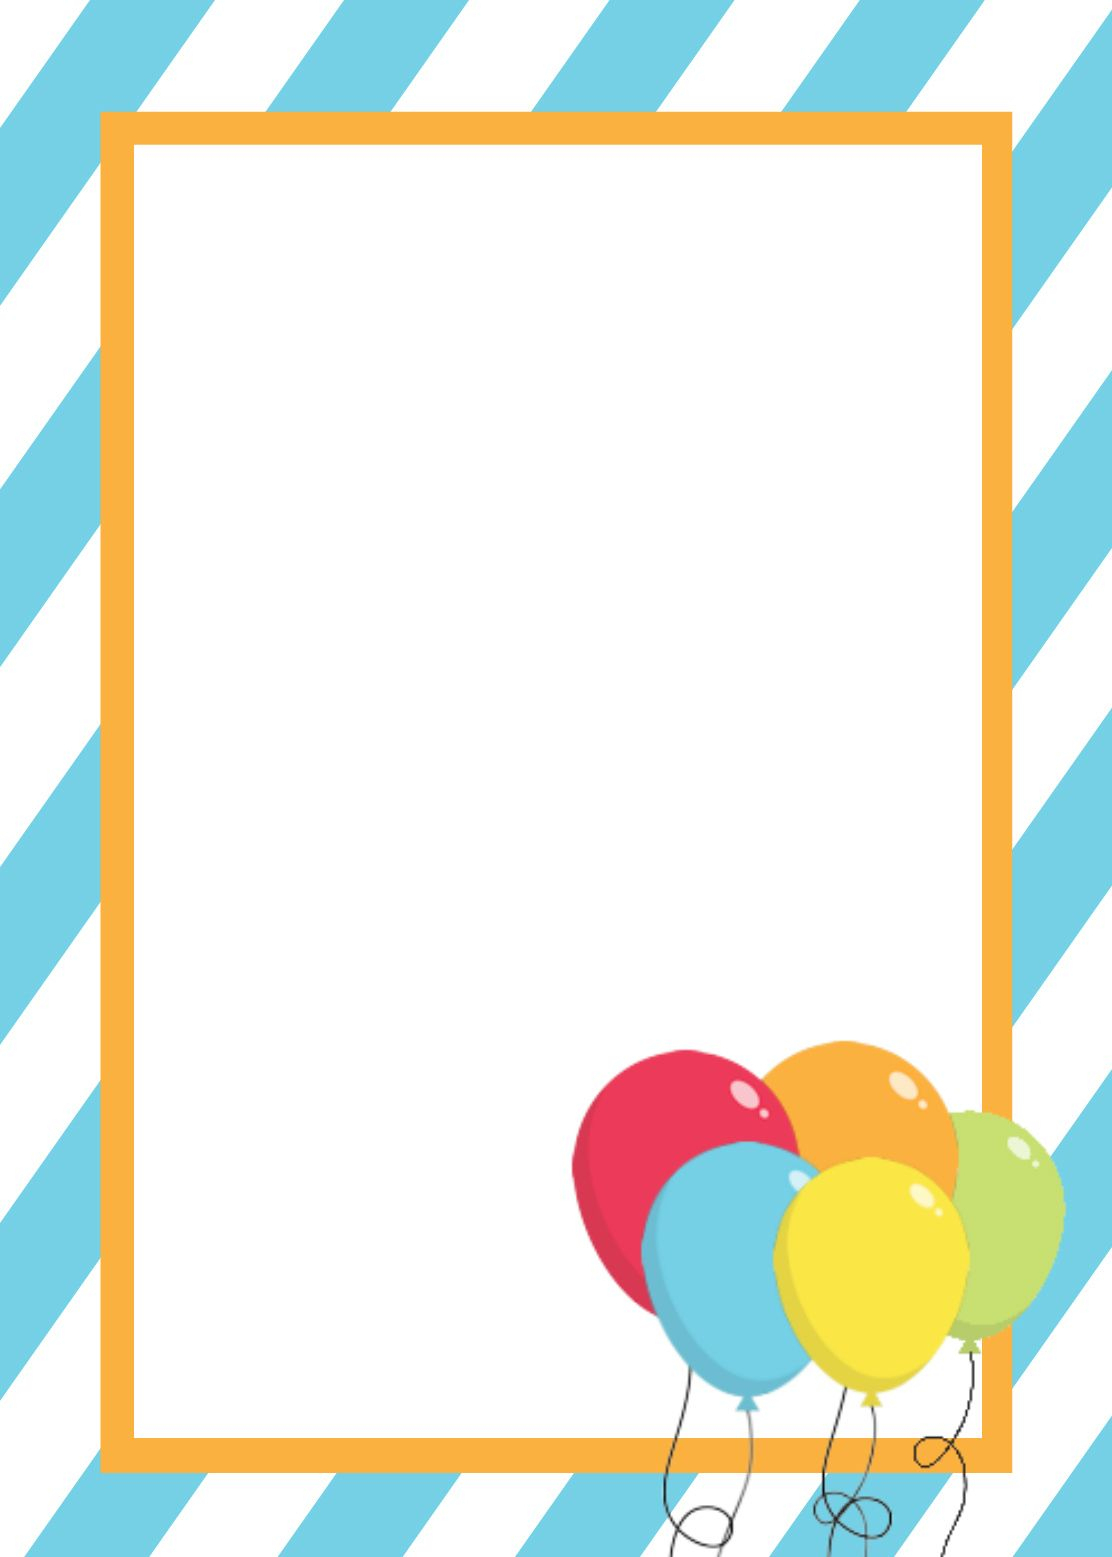 Free Printable Birthday Invitation Templates | Birthday Ideas And - Free Printable Birthday Invitation Cards Templates